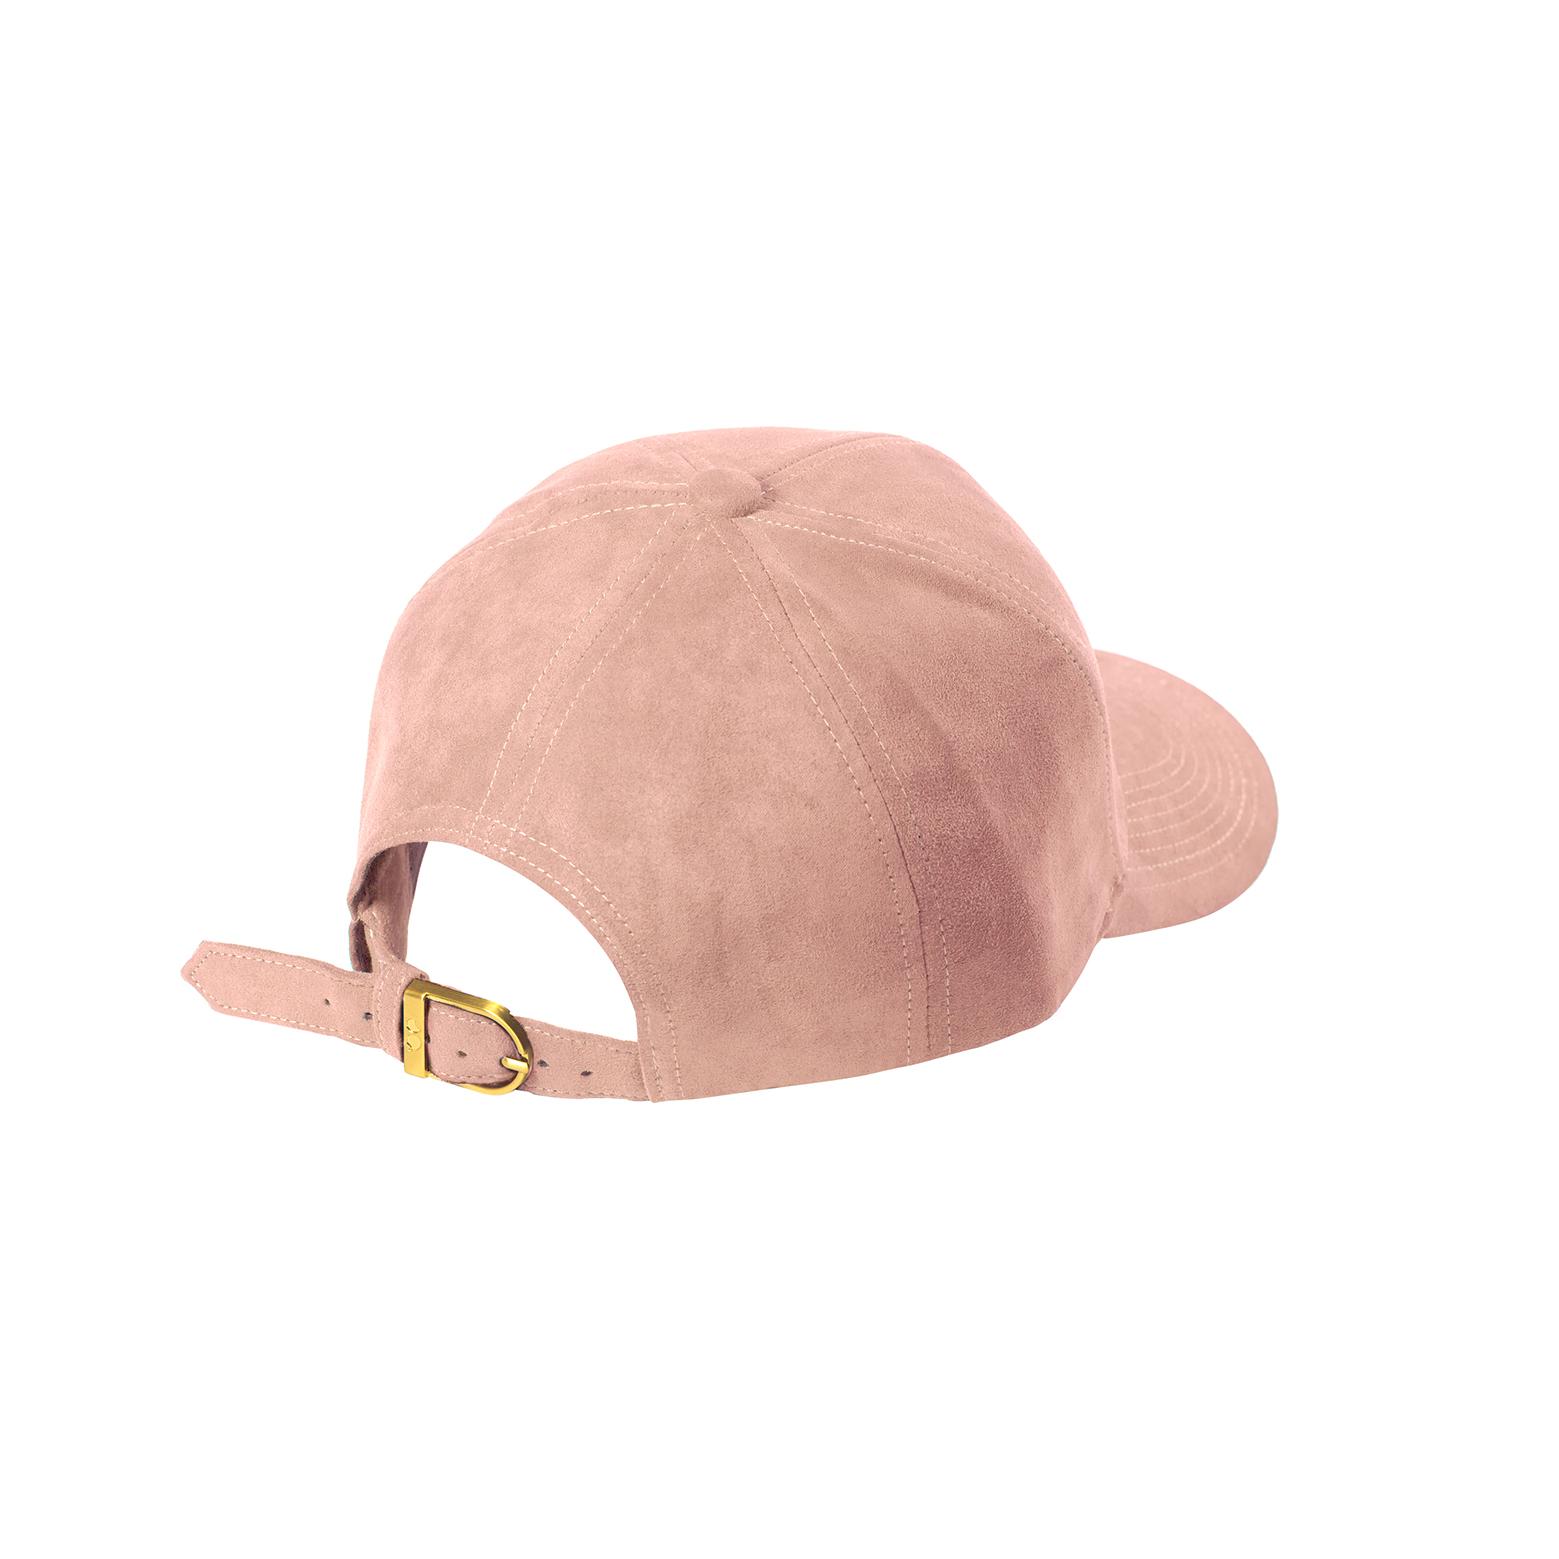 BASEBALL CAP CLOUD PINK SUEDE GOLD BACK SIDE